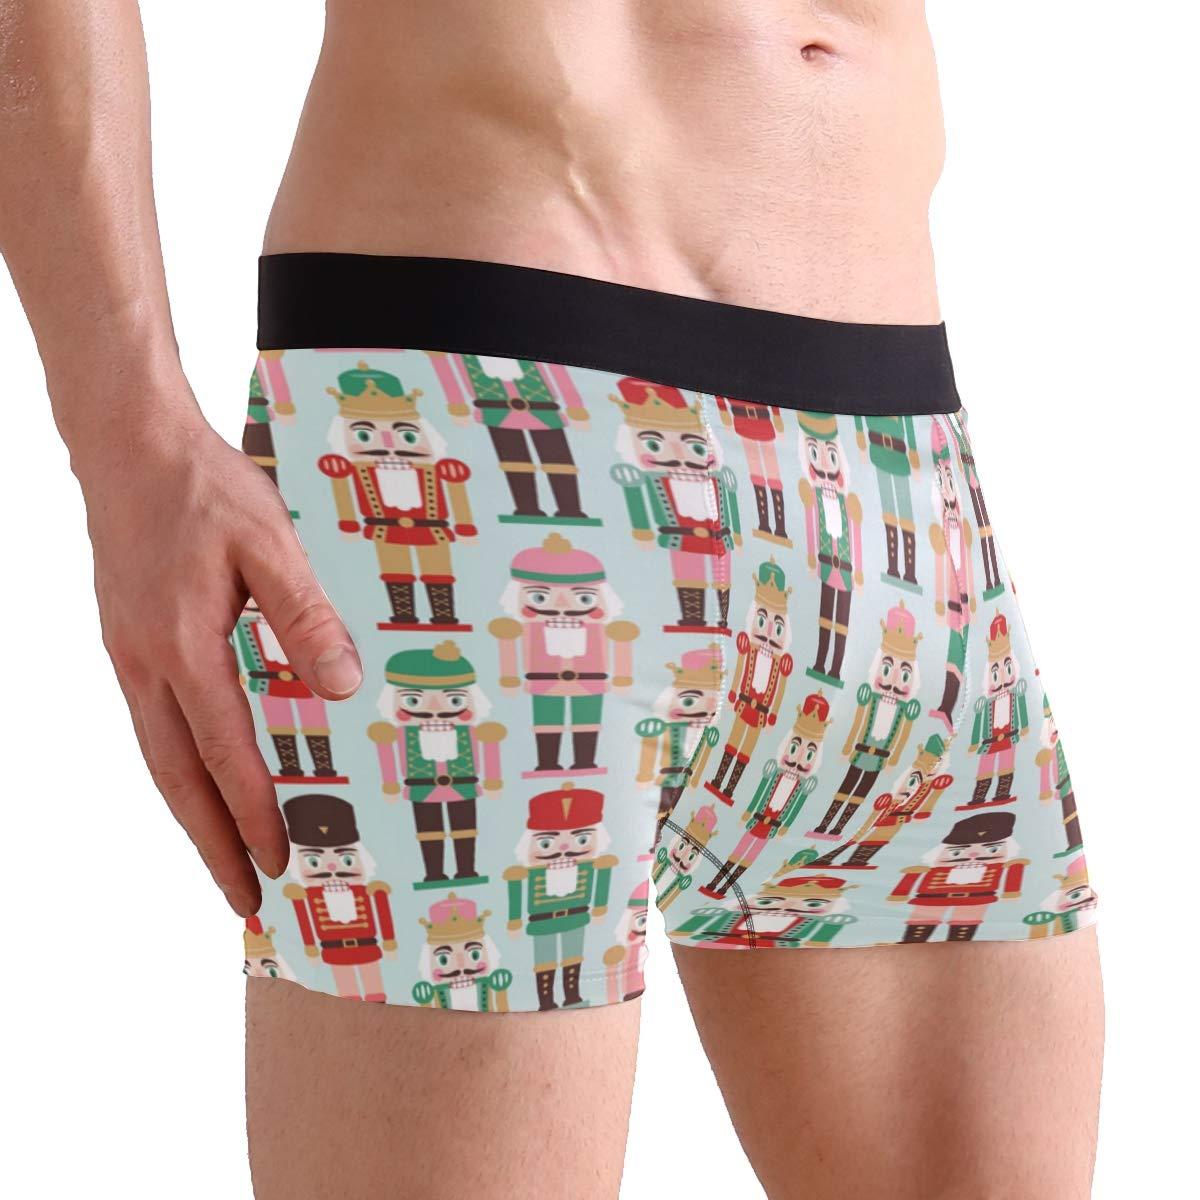 Fonmifer Addressed Nutcracker Envelopes Boxer Briefs Mens Underpants Underwear Boxer Shorts for Mens and Boys